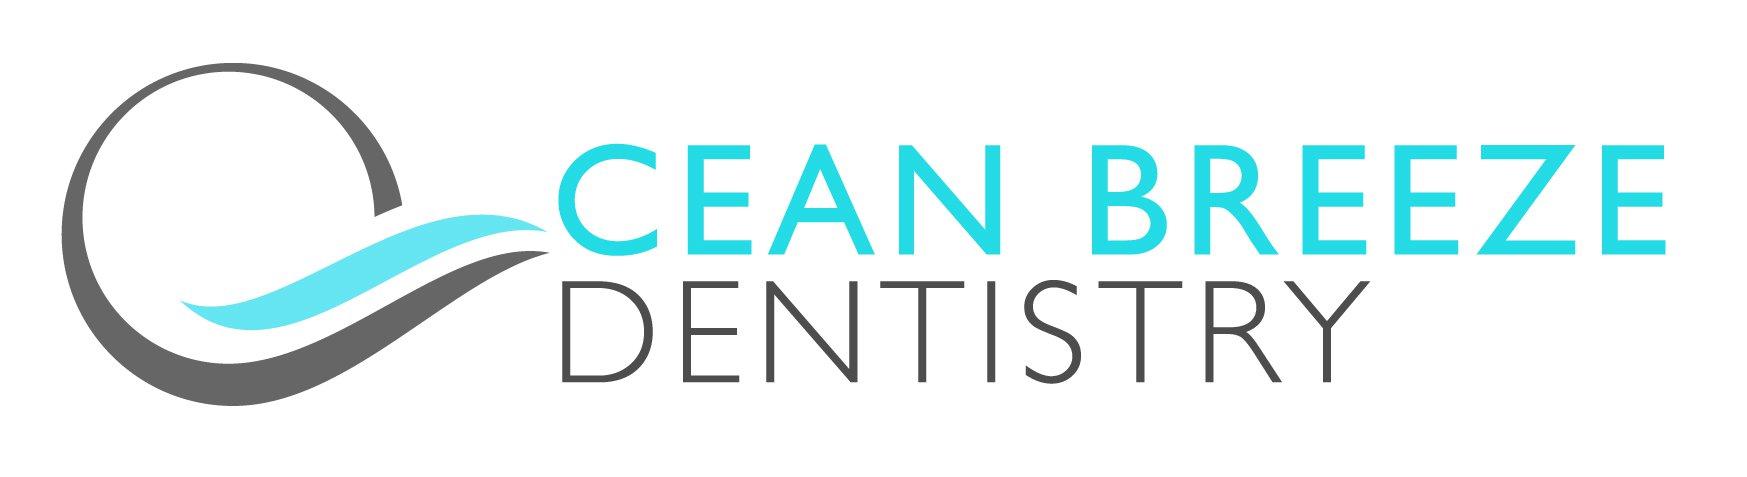 http://oceanbreezedentistry.com/wp-content/uploads/2019/05/original_ocean-dentistry-logo-color1.jpg